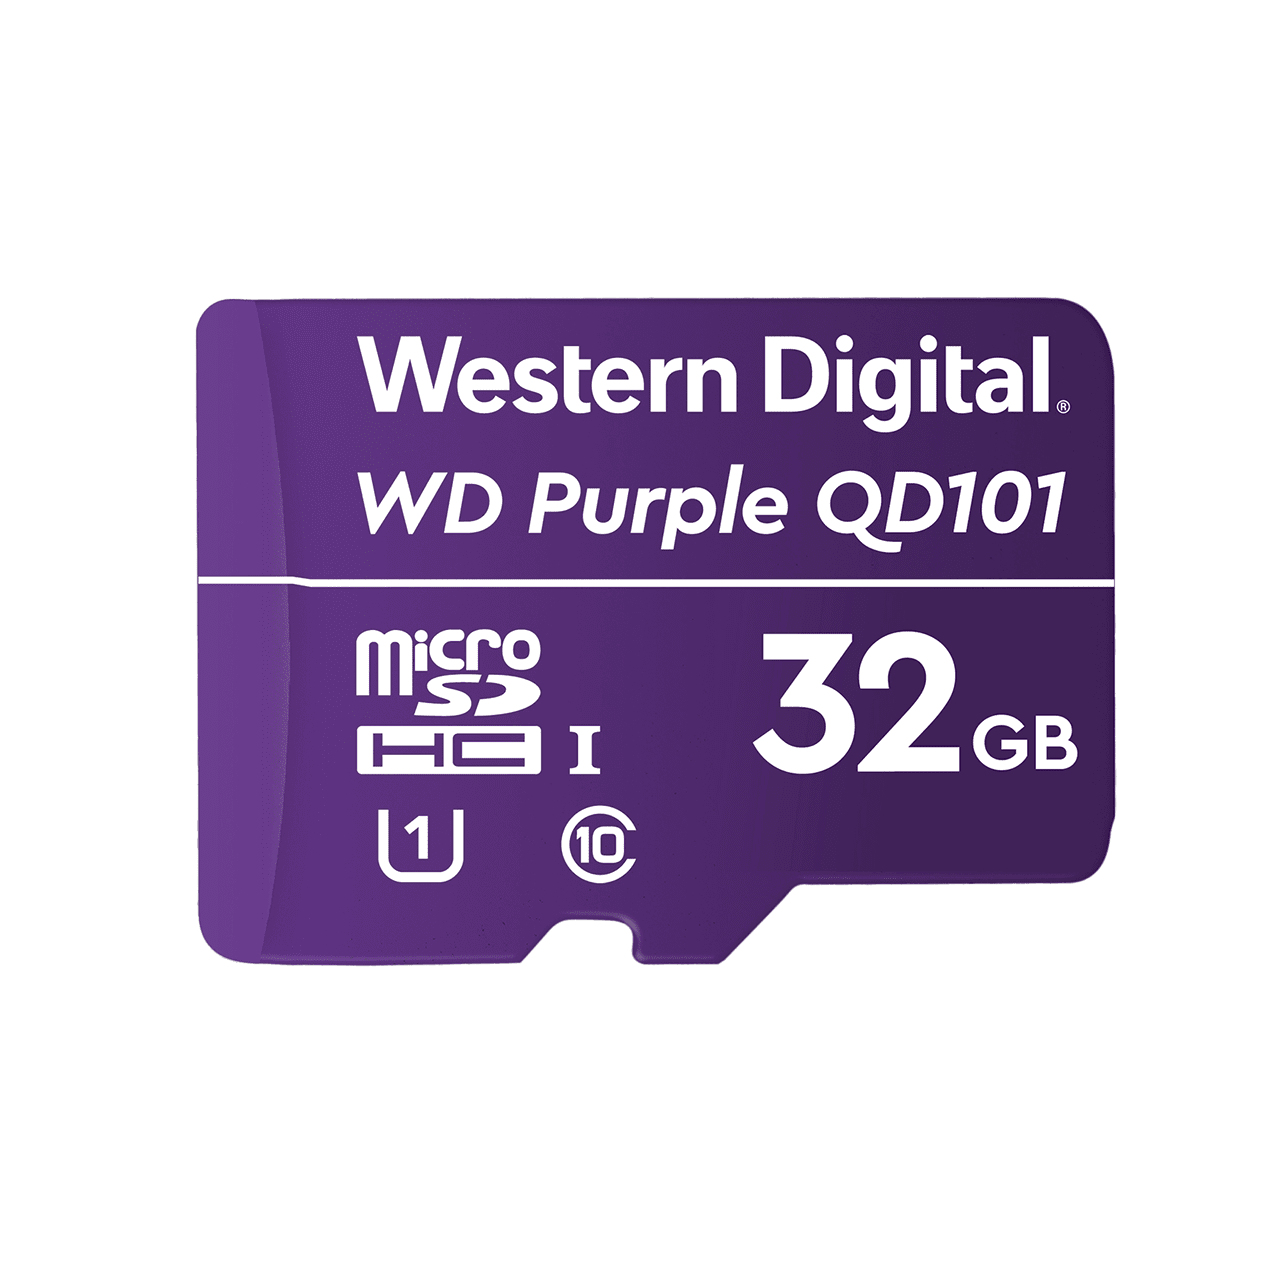 Western Digital WD Purple SC QD101 memory card 32 GB MicroSDHC Class 10